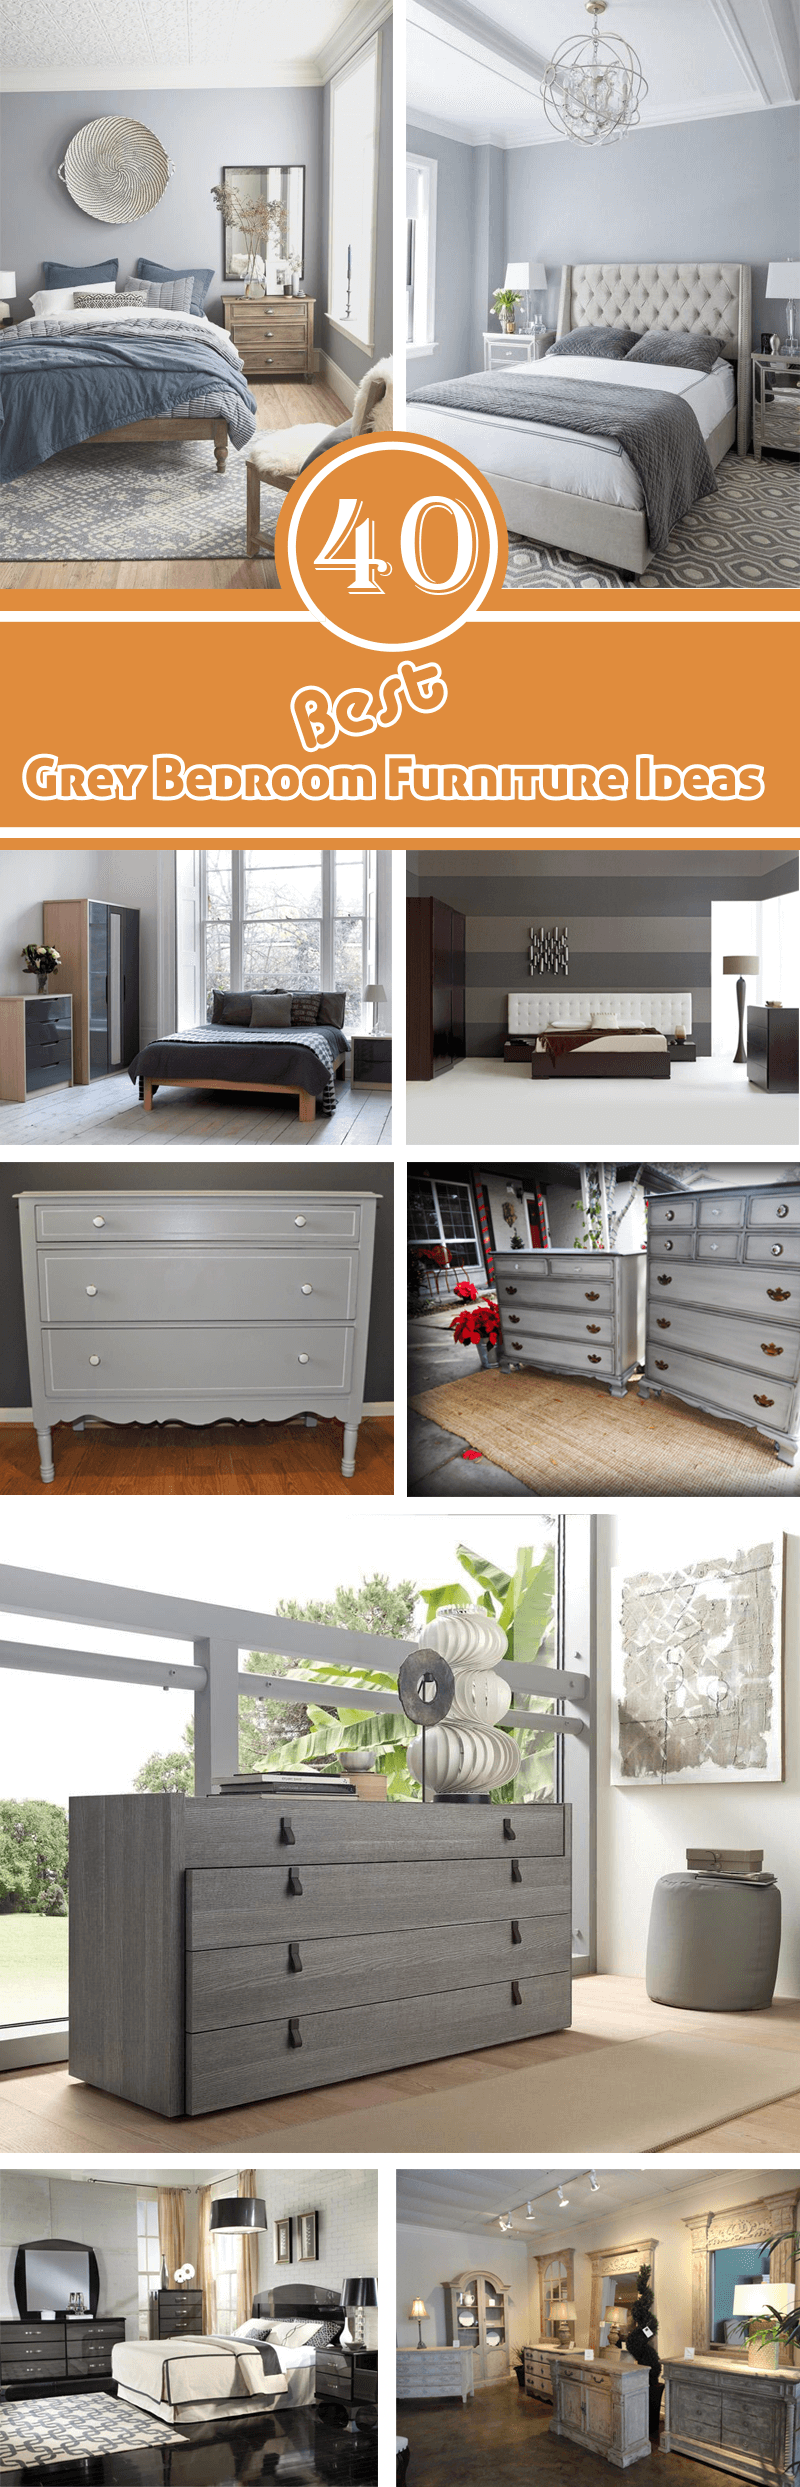 Best Grey Bedroom Furniture Ideas